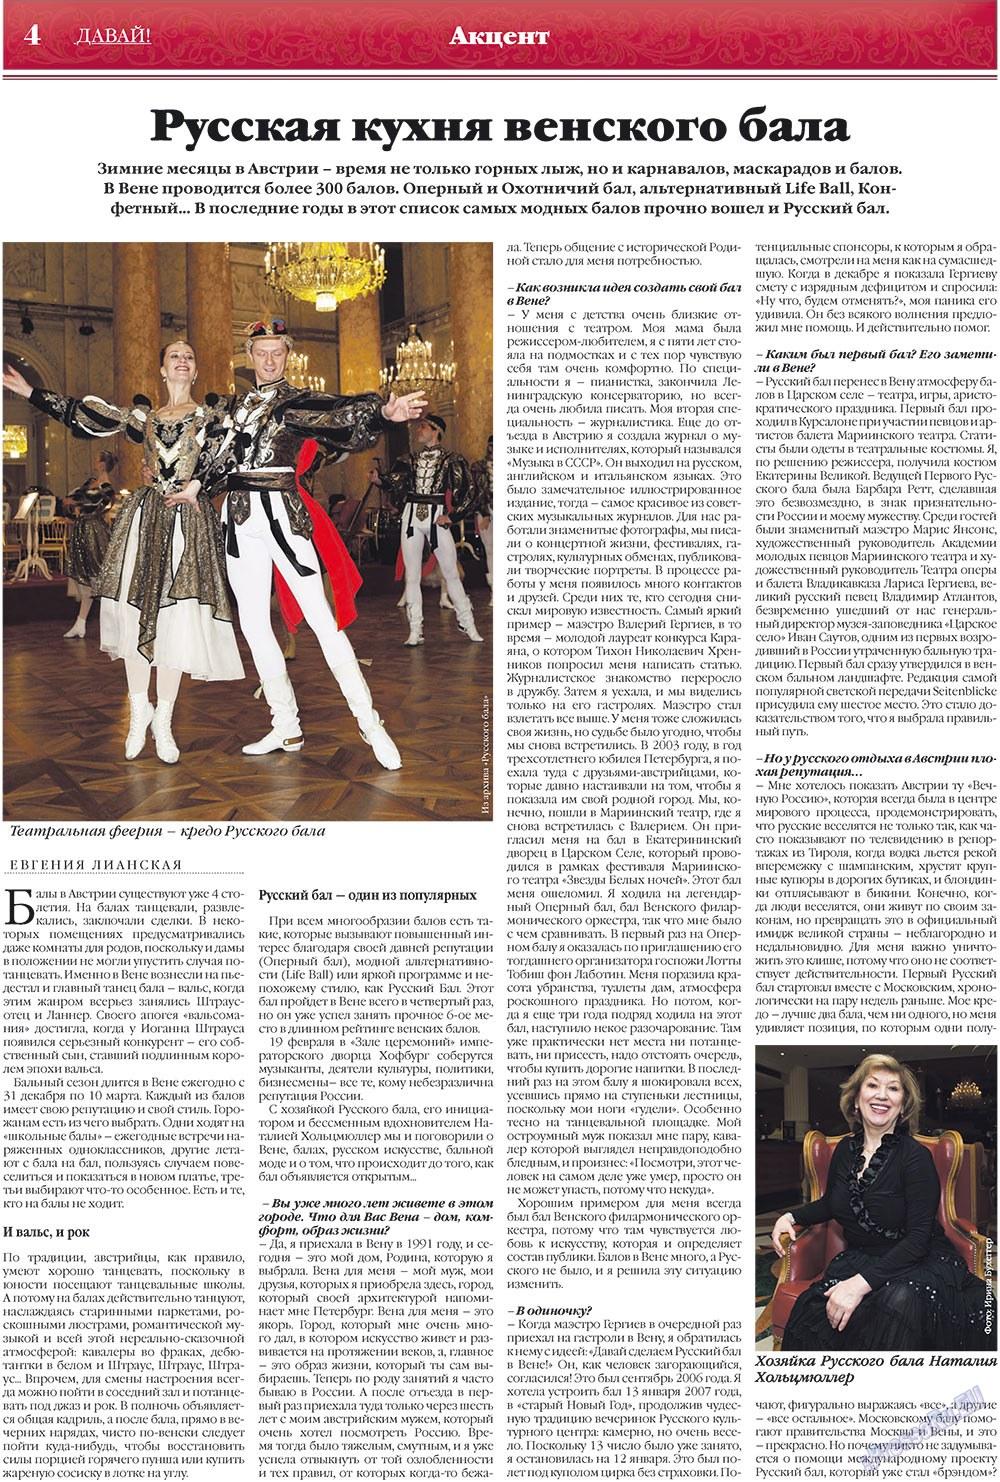 Давай (газета). 2010 год, номер 1, стр. 4